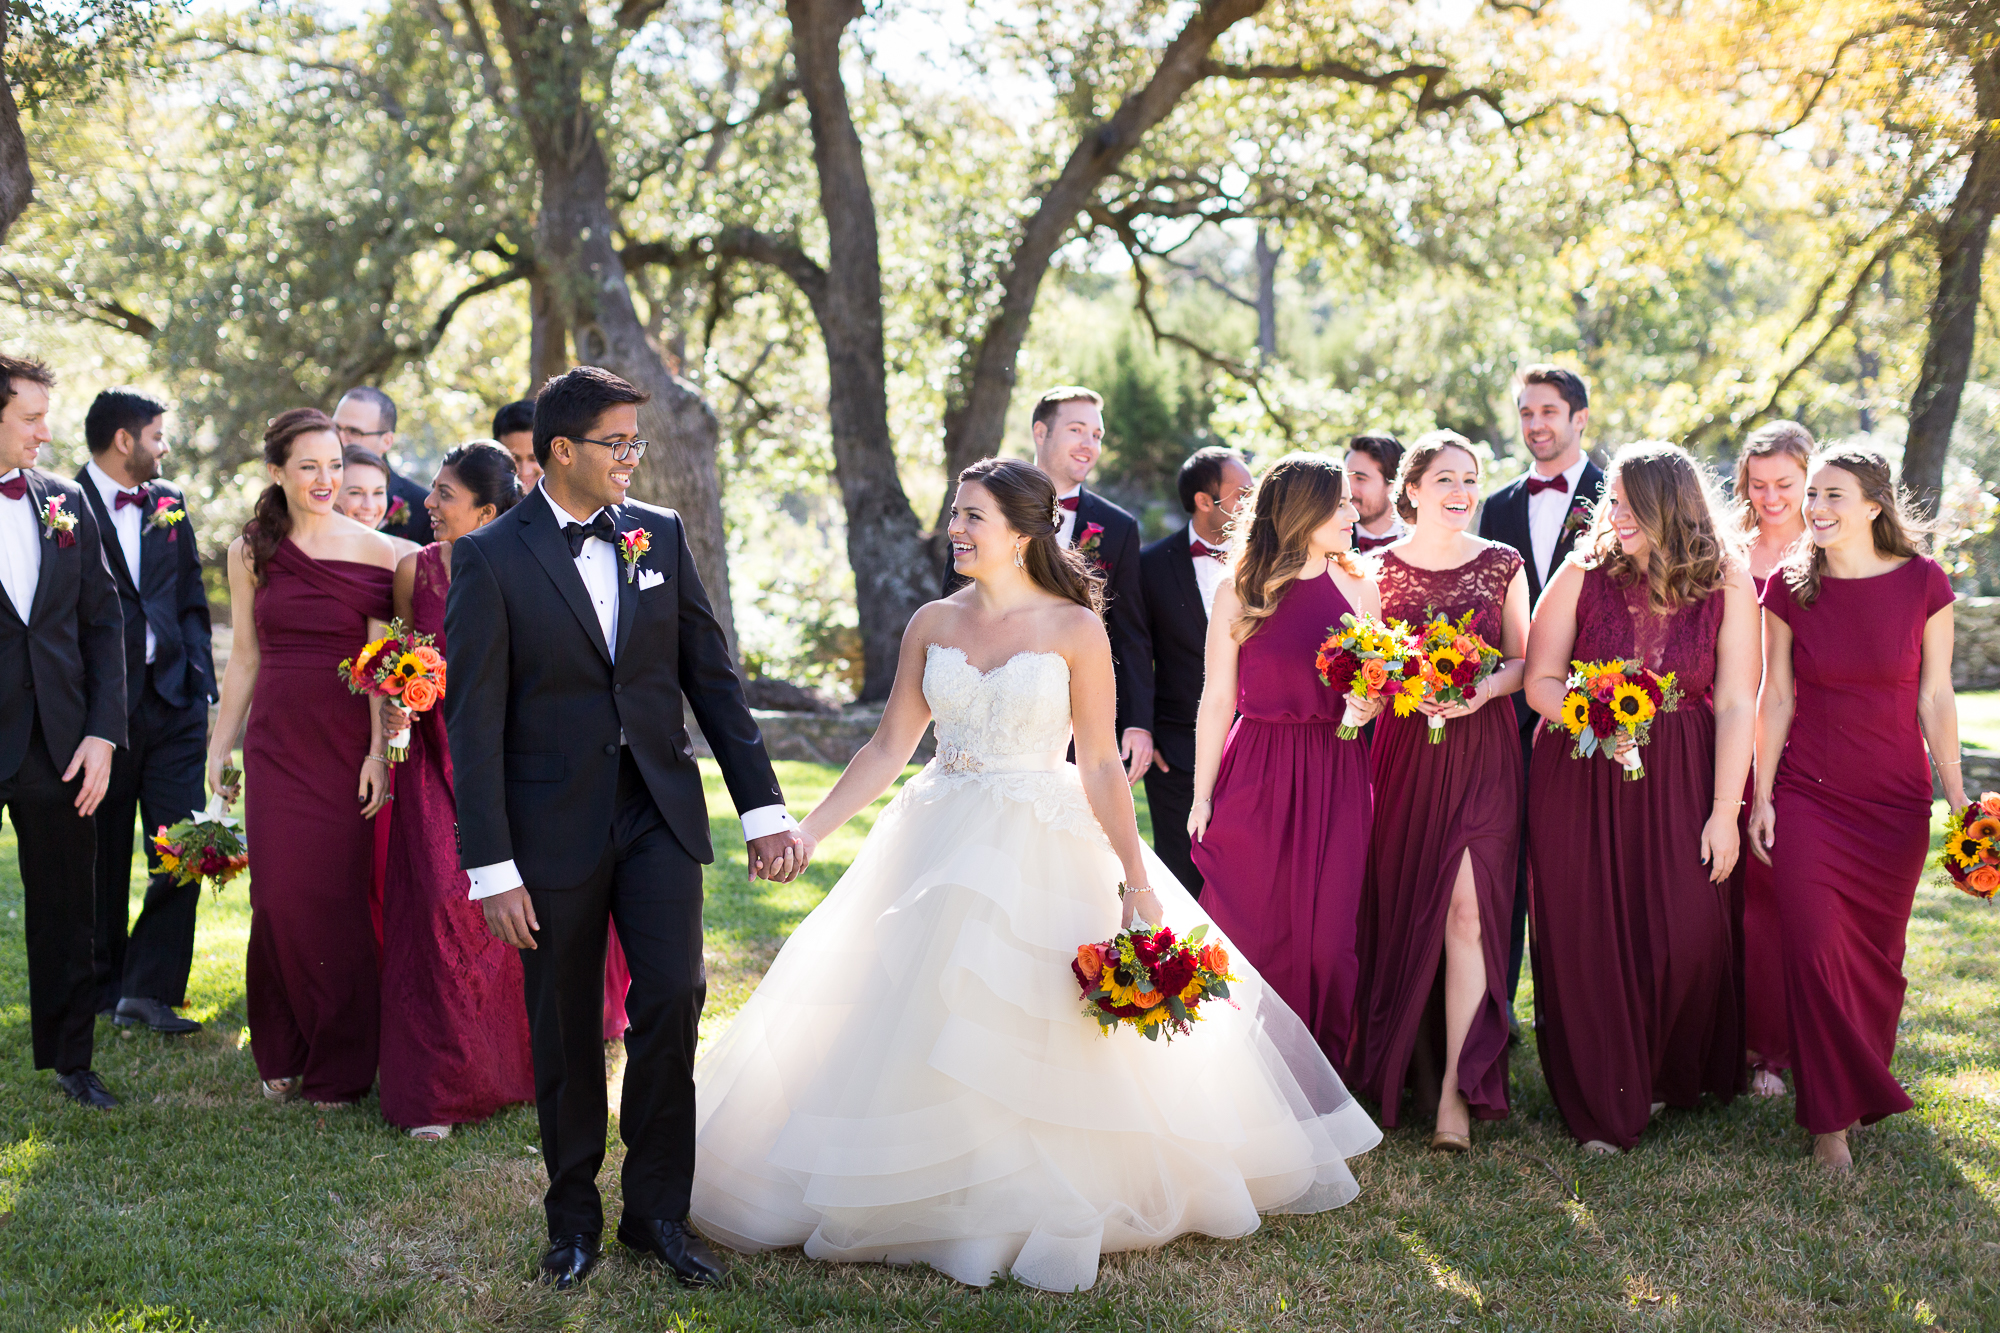 hill-country-weddingX-005.jpg